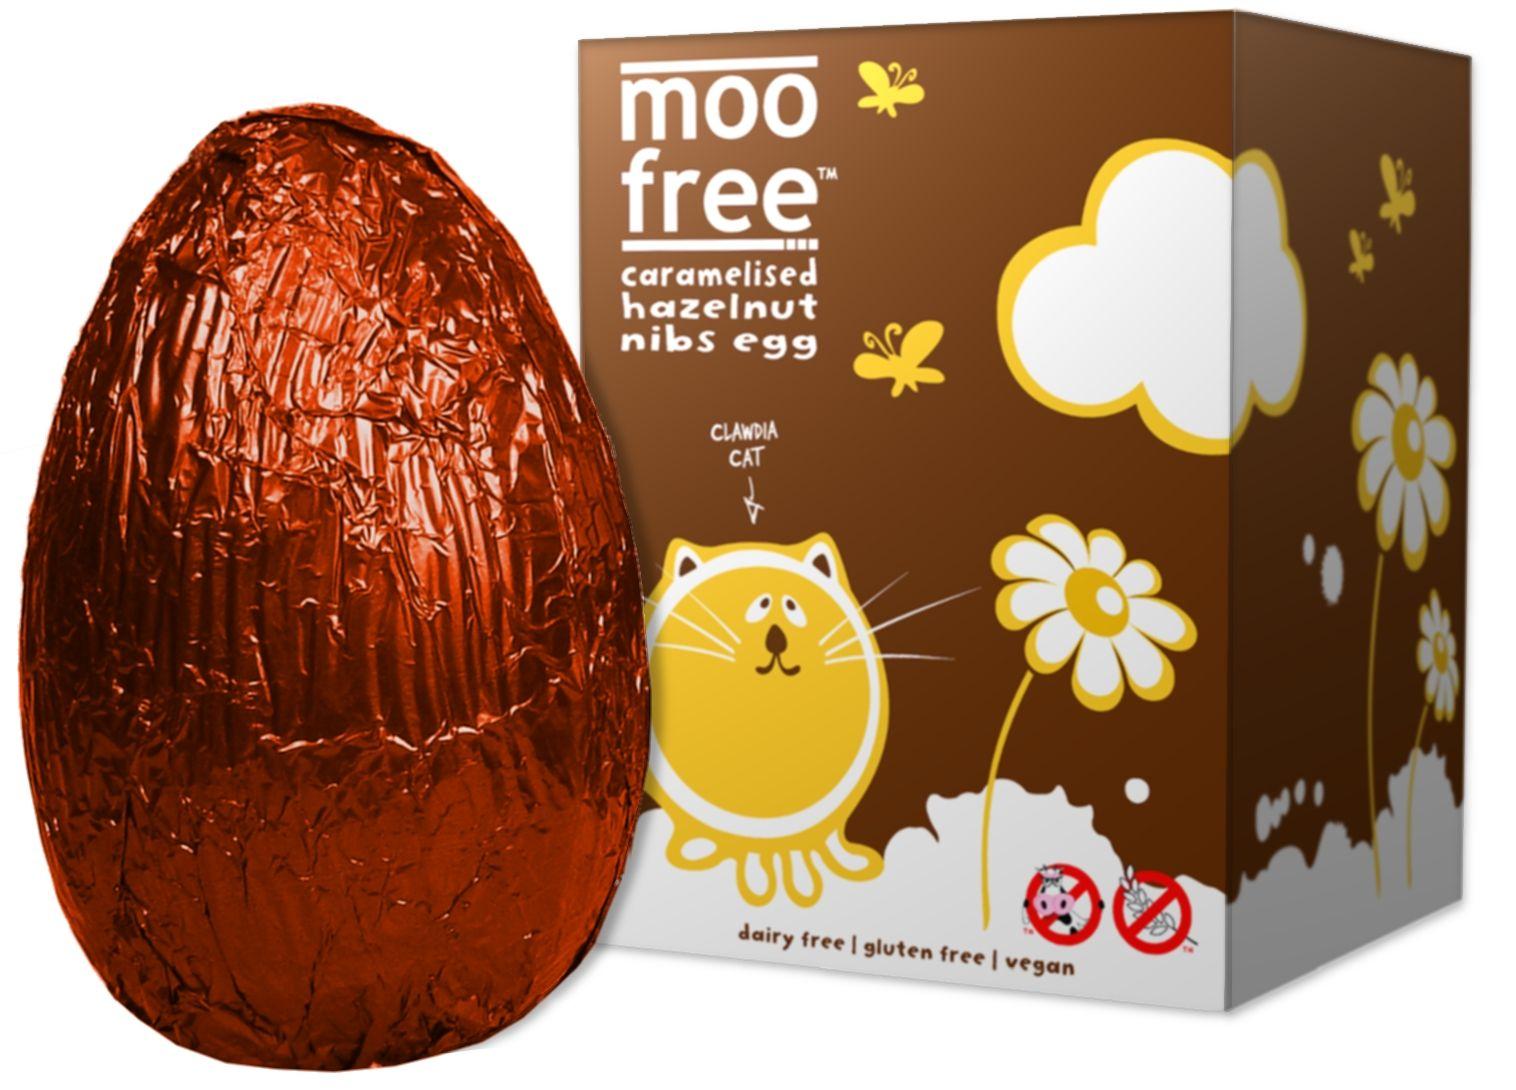 Organic Caramelised Hazelnut Nibs Easter Egg gluten free